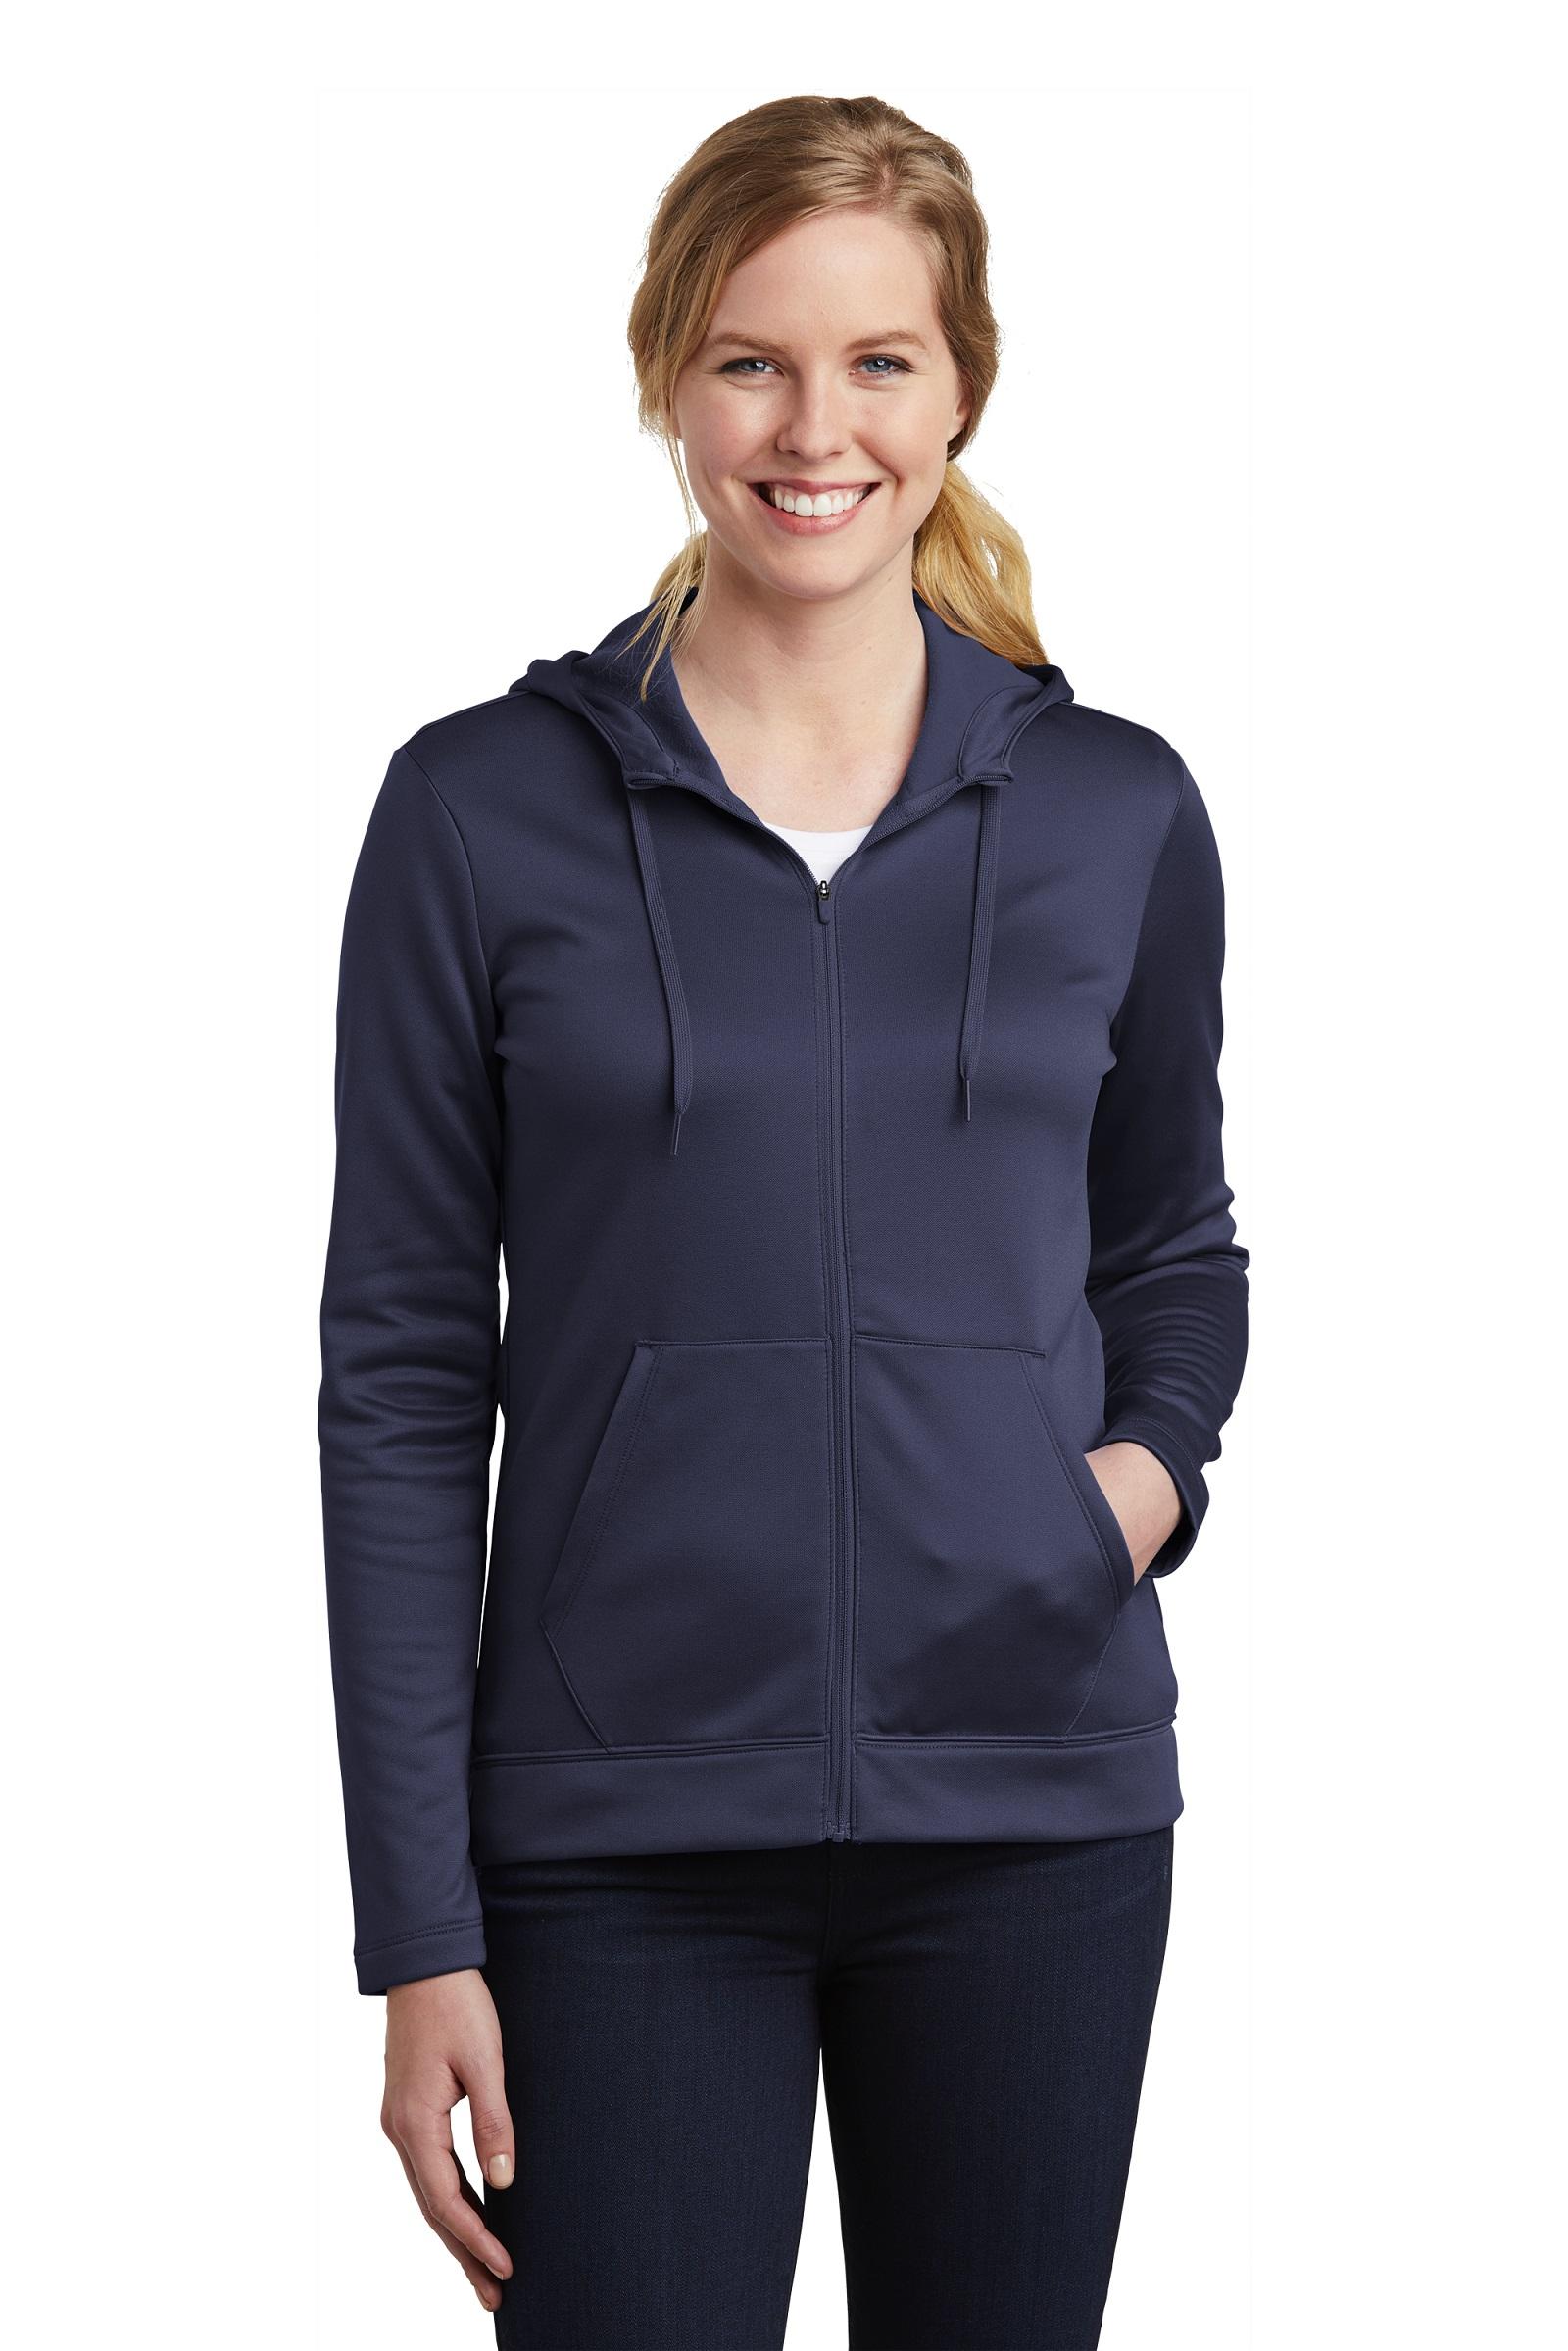 Nike Embroidered Women's Therma-FIT Full-Zip Fleece Hoodie